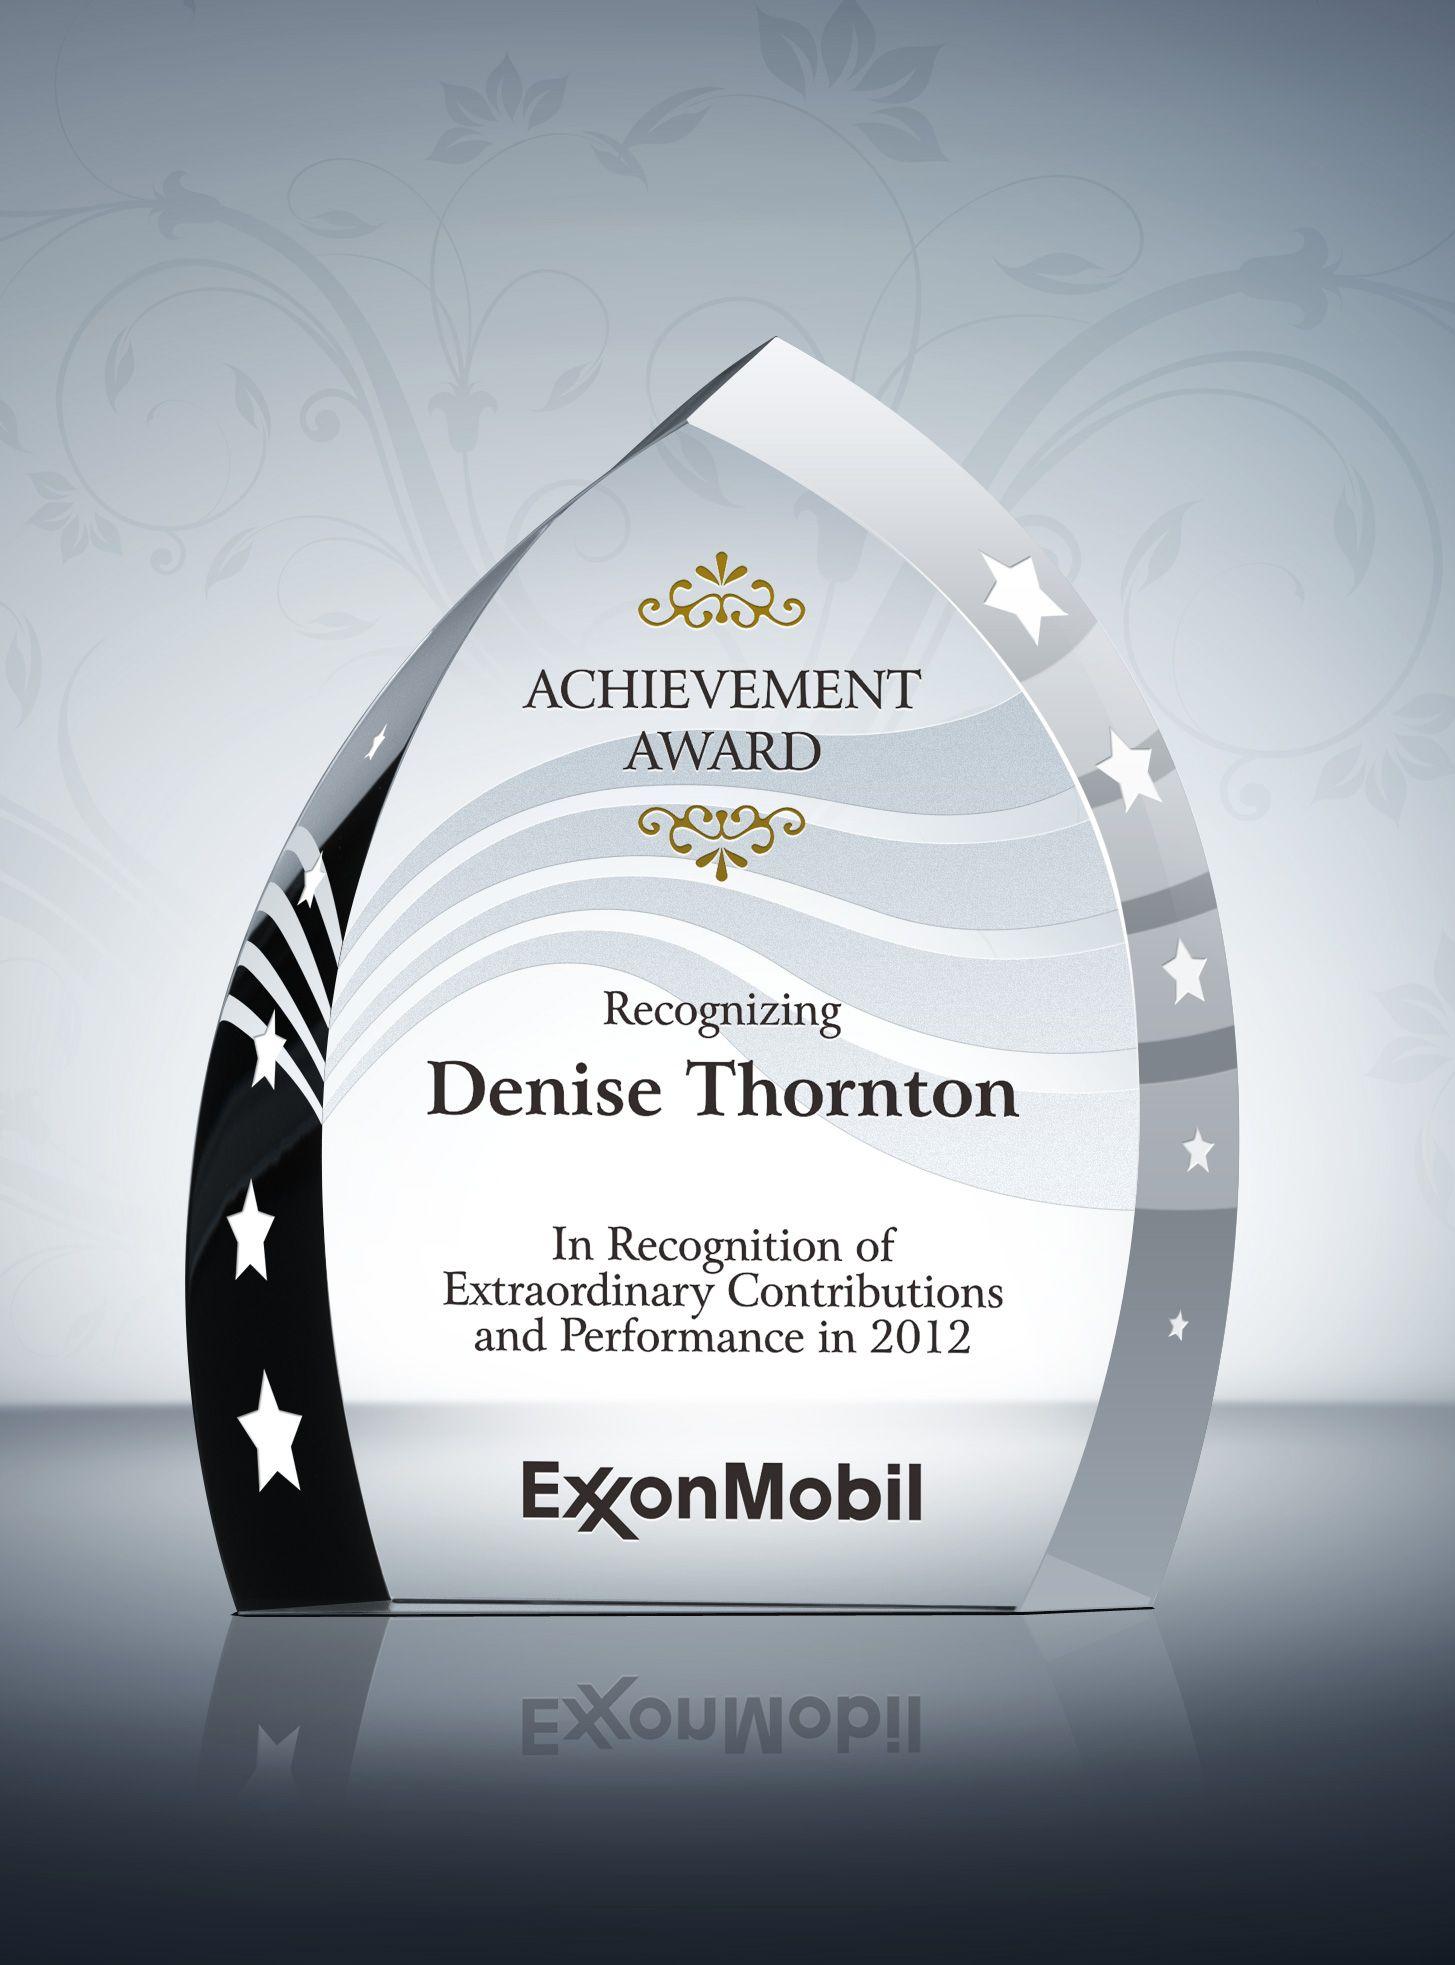 Employee Achievement Award Products